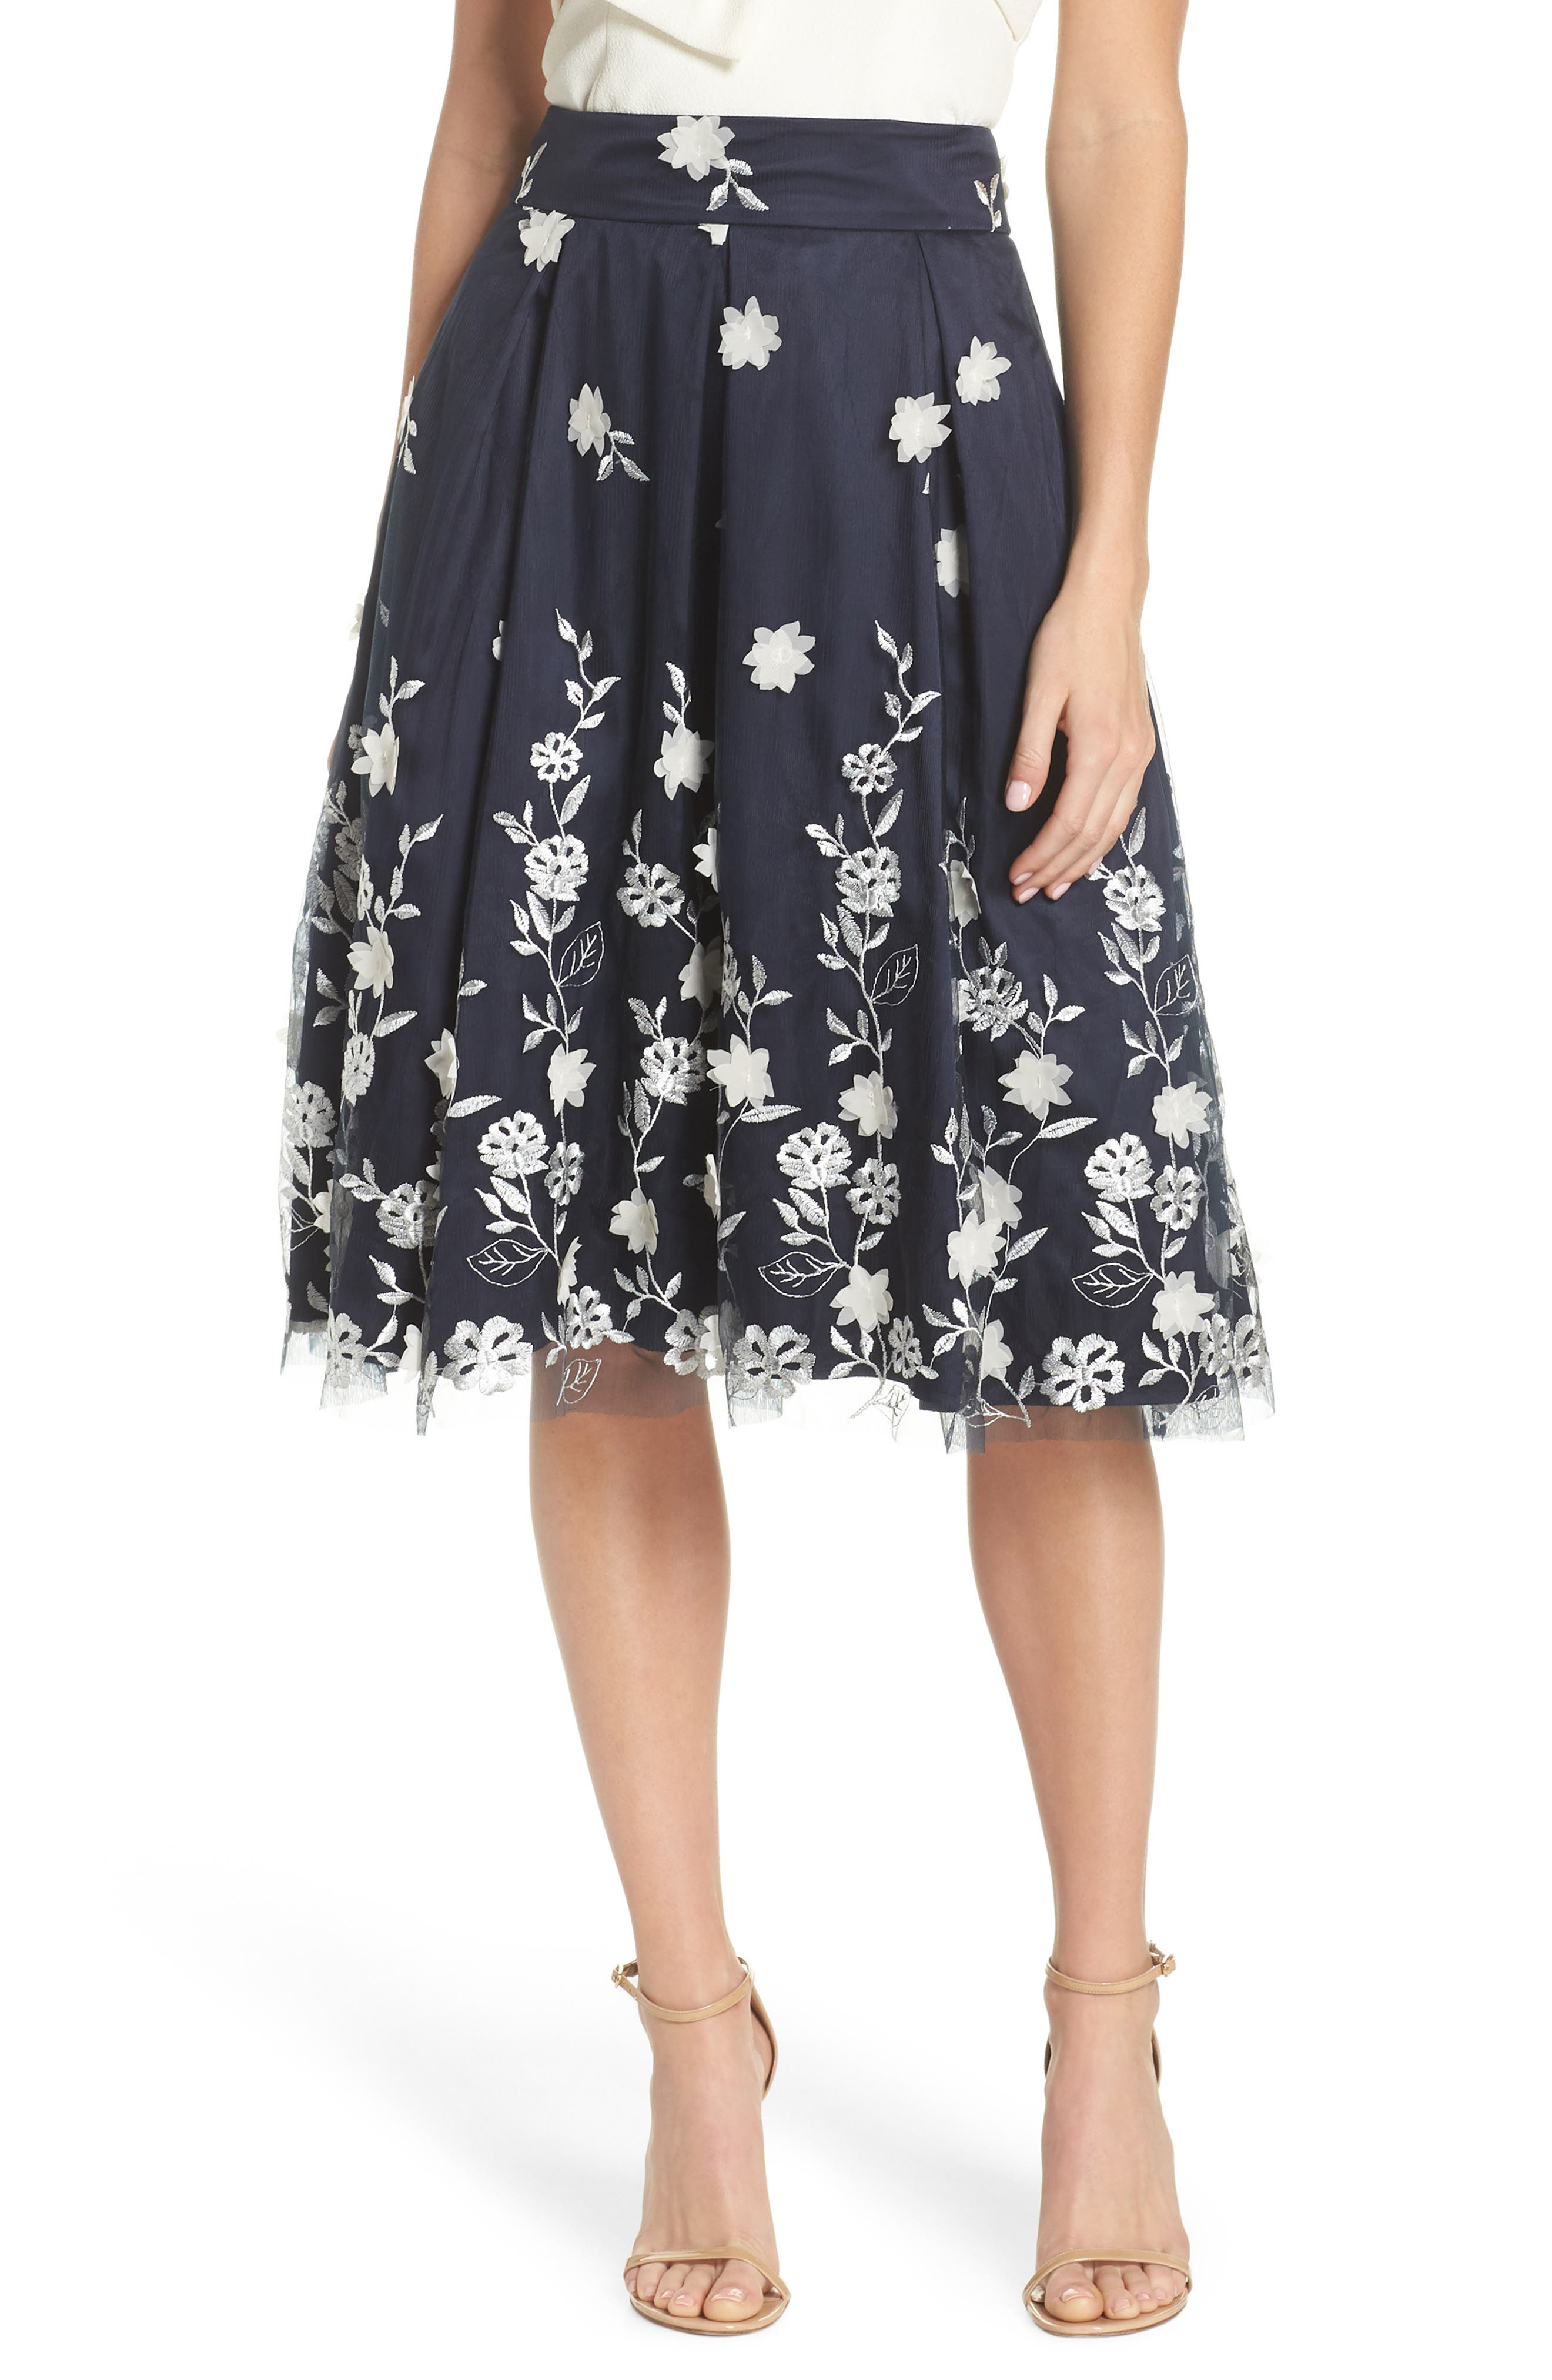 Alternate Image 1 Selected - Eliza J Embroidered A-Line Skirt